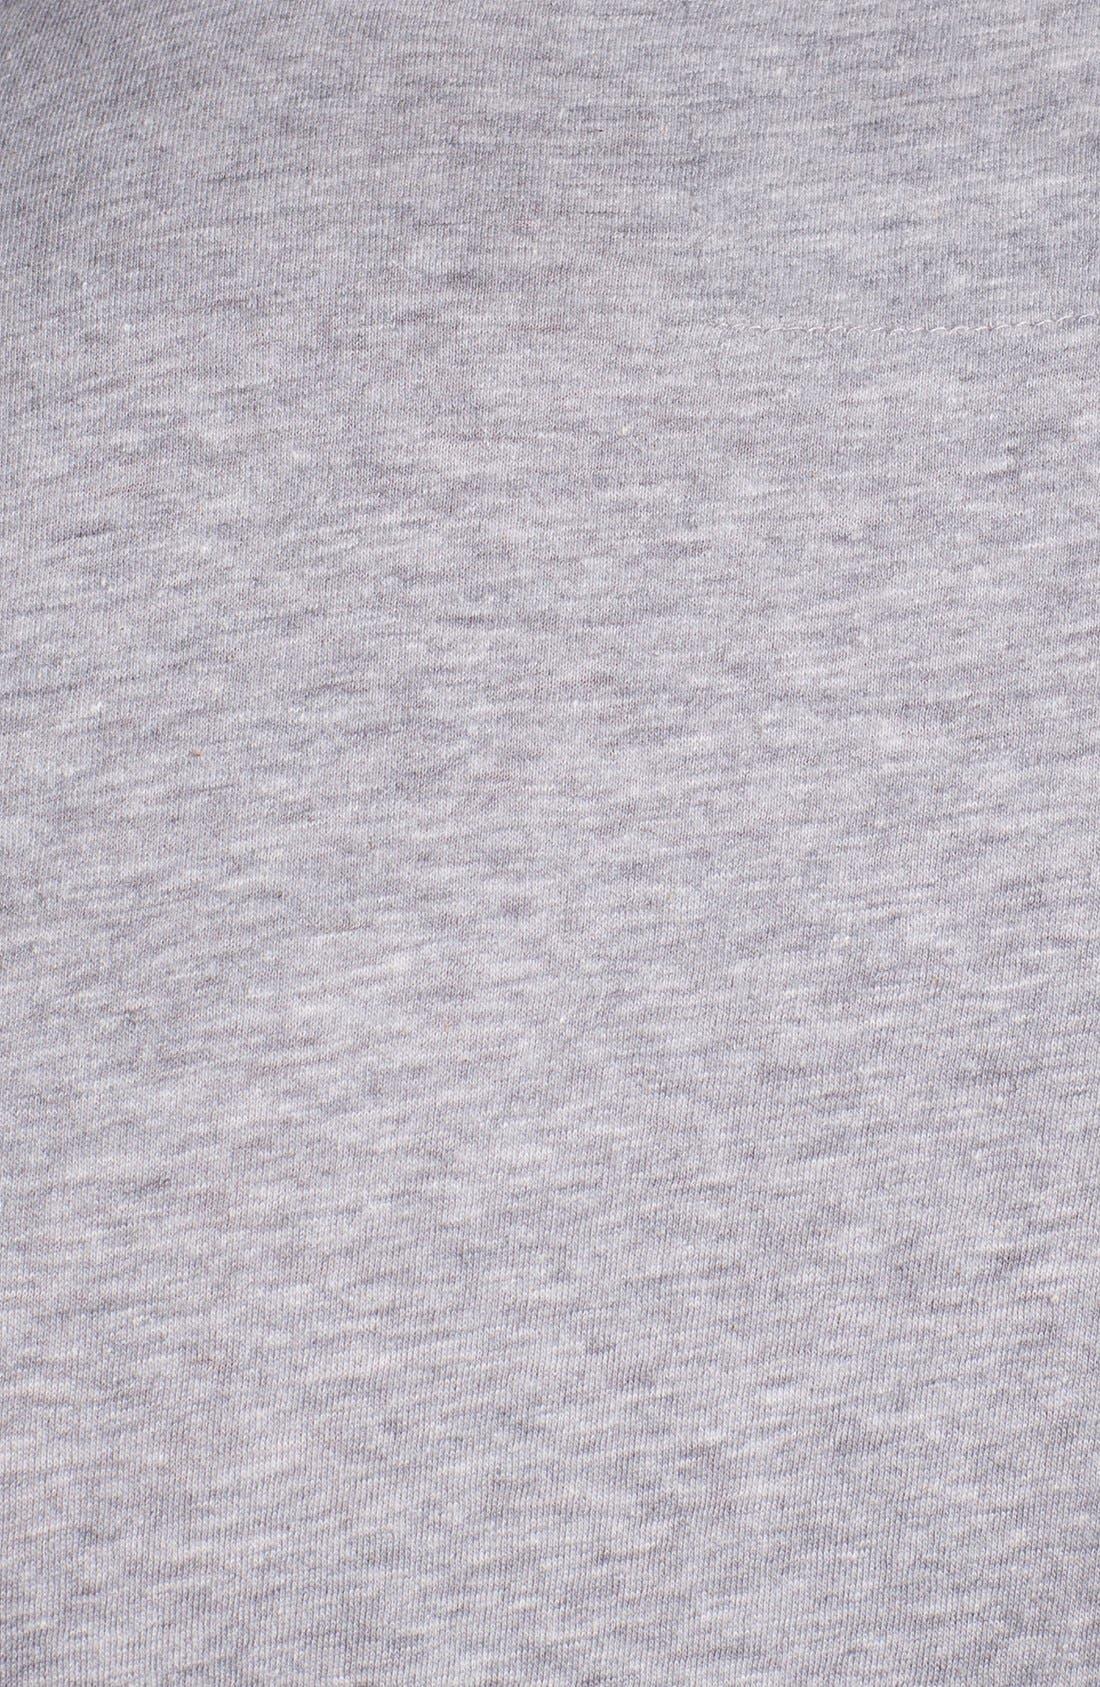 Alternate Image 3  - Red Jacket 'Blackhawks - Brass Tack' T-Shirt